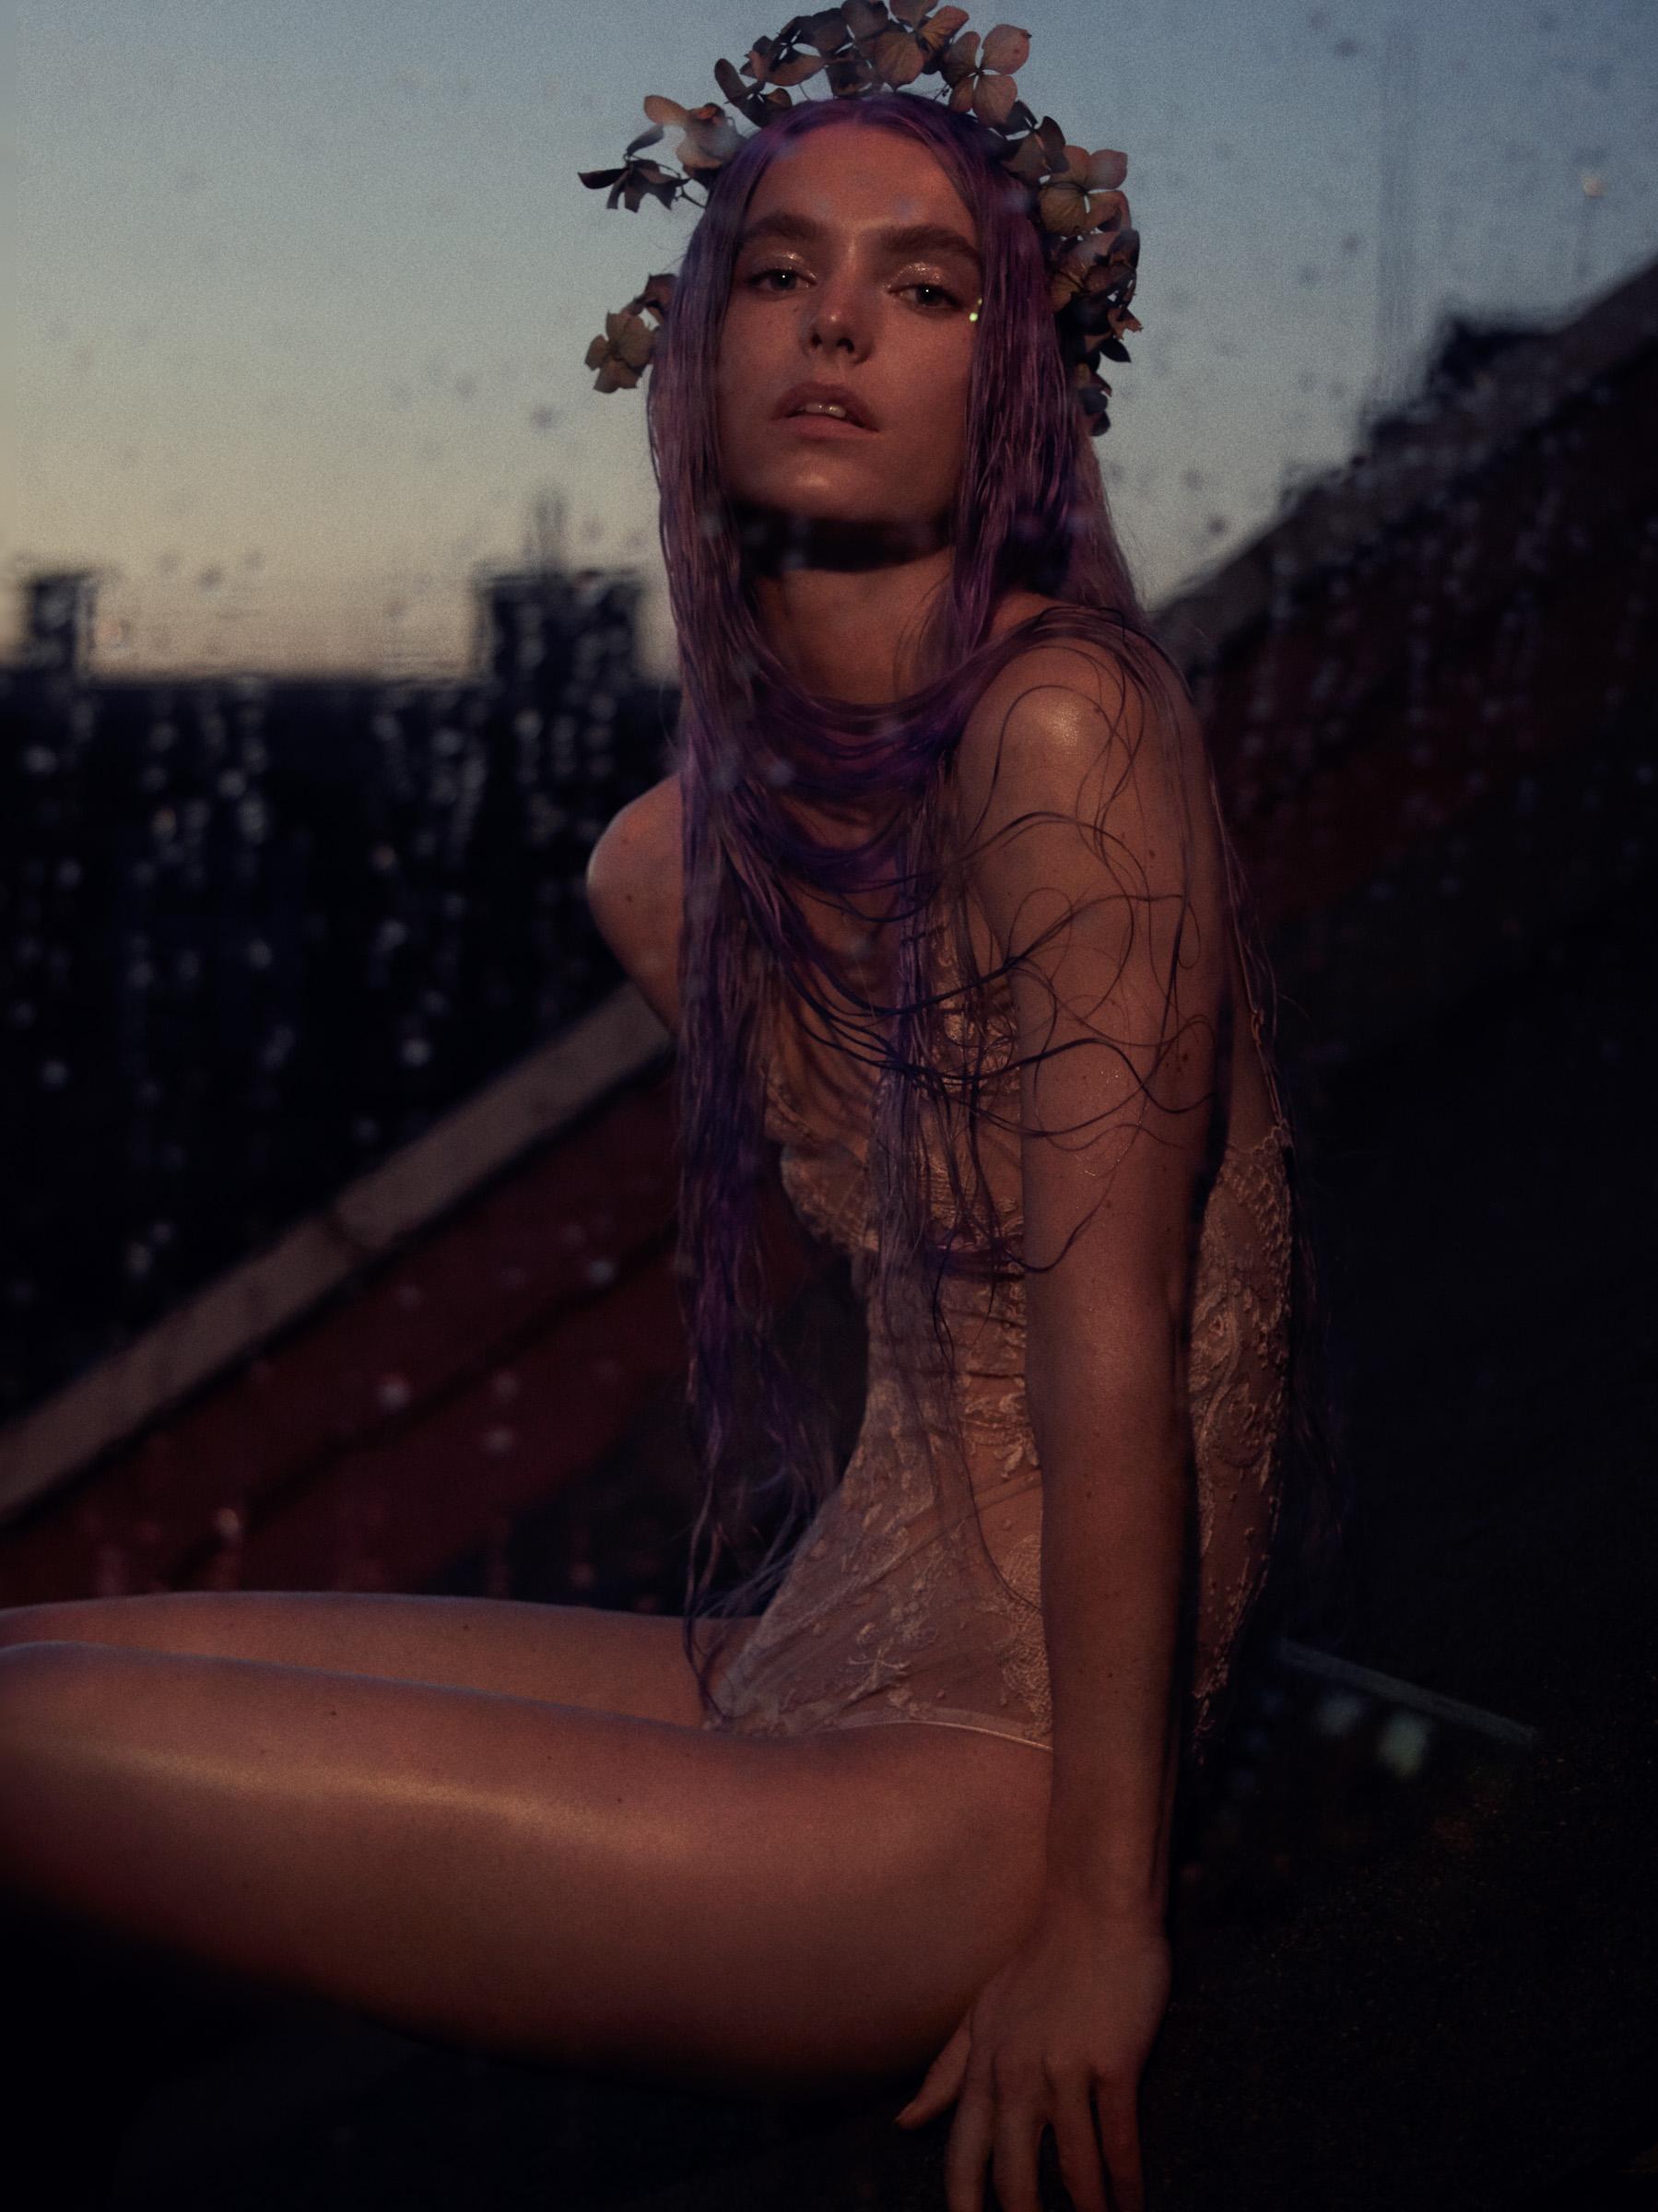 Jack-Eames-Ali-Pirzadeh-Wigs-LA-Feeling-Hair-Beauty-Photography-Campaign-03.jpg